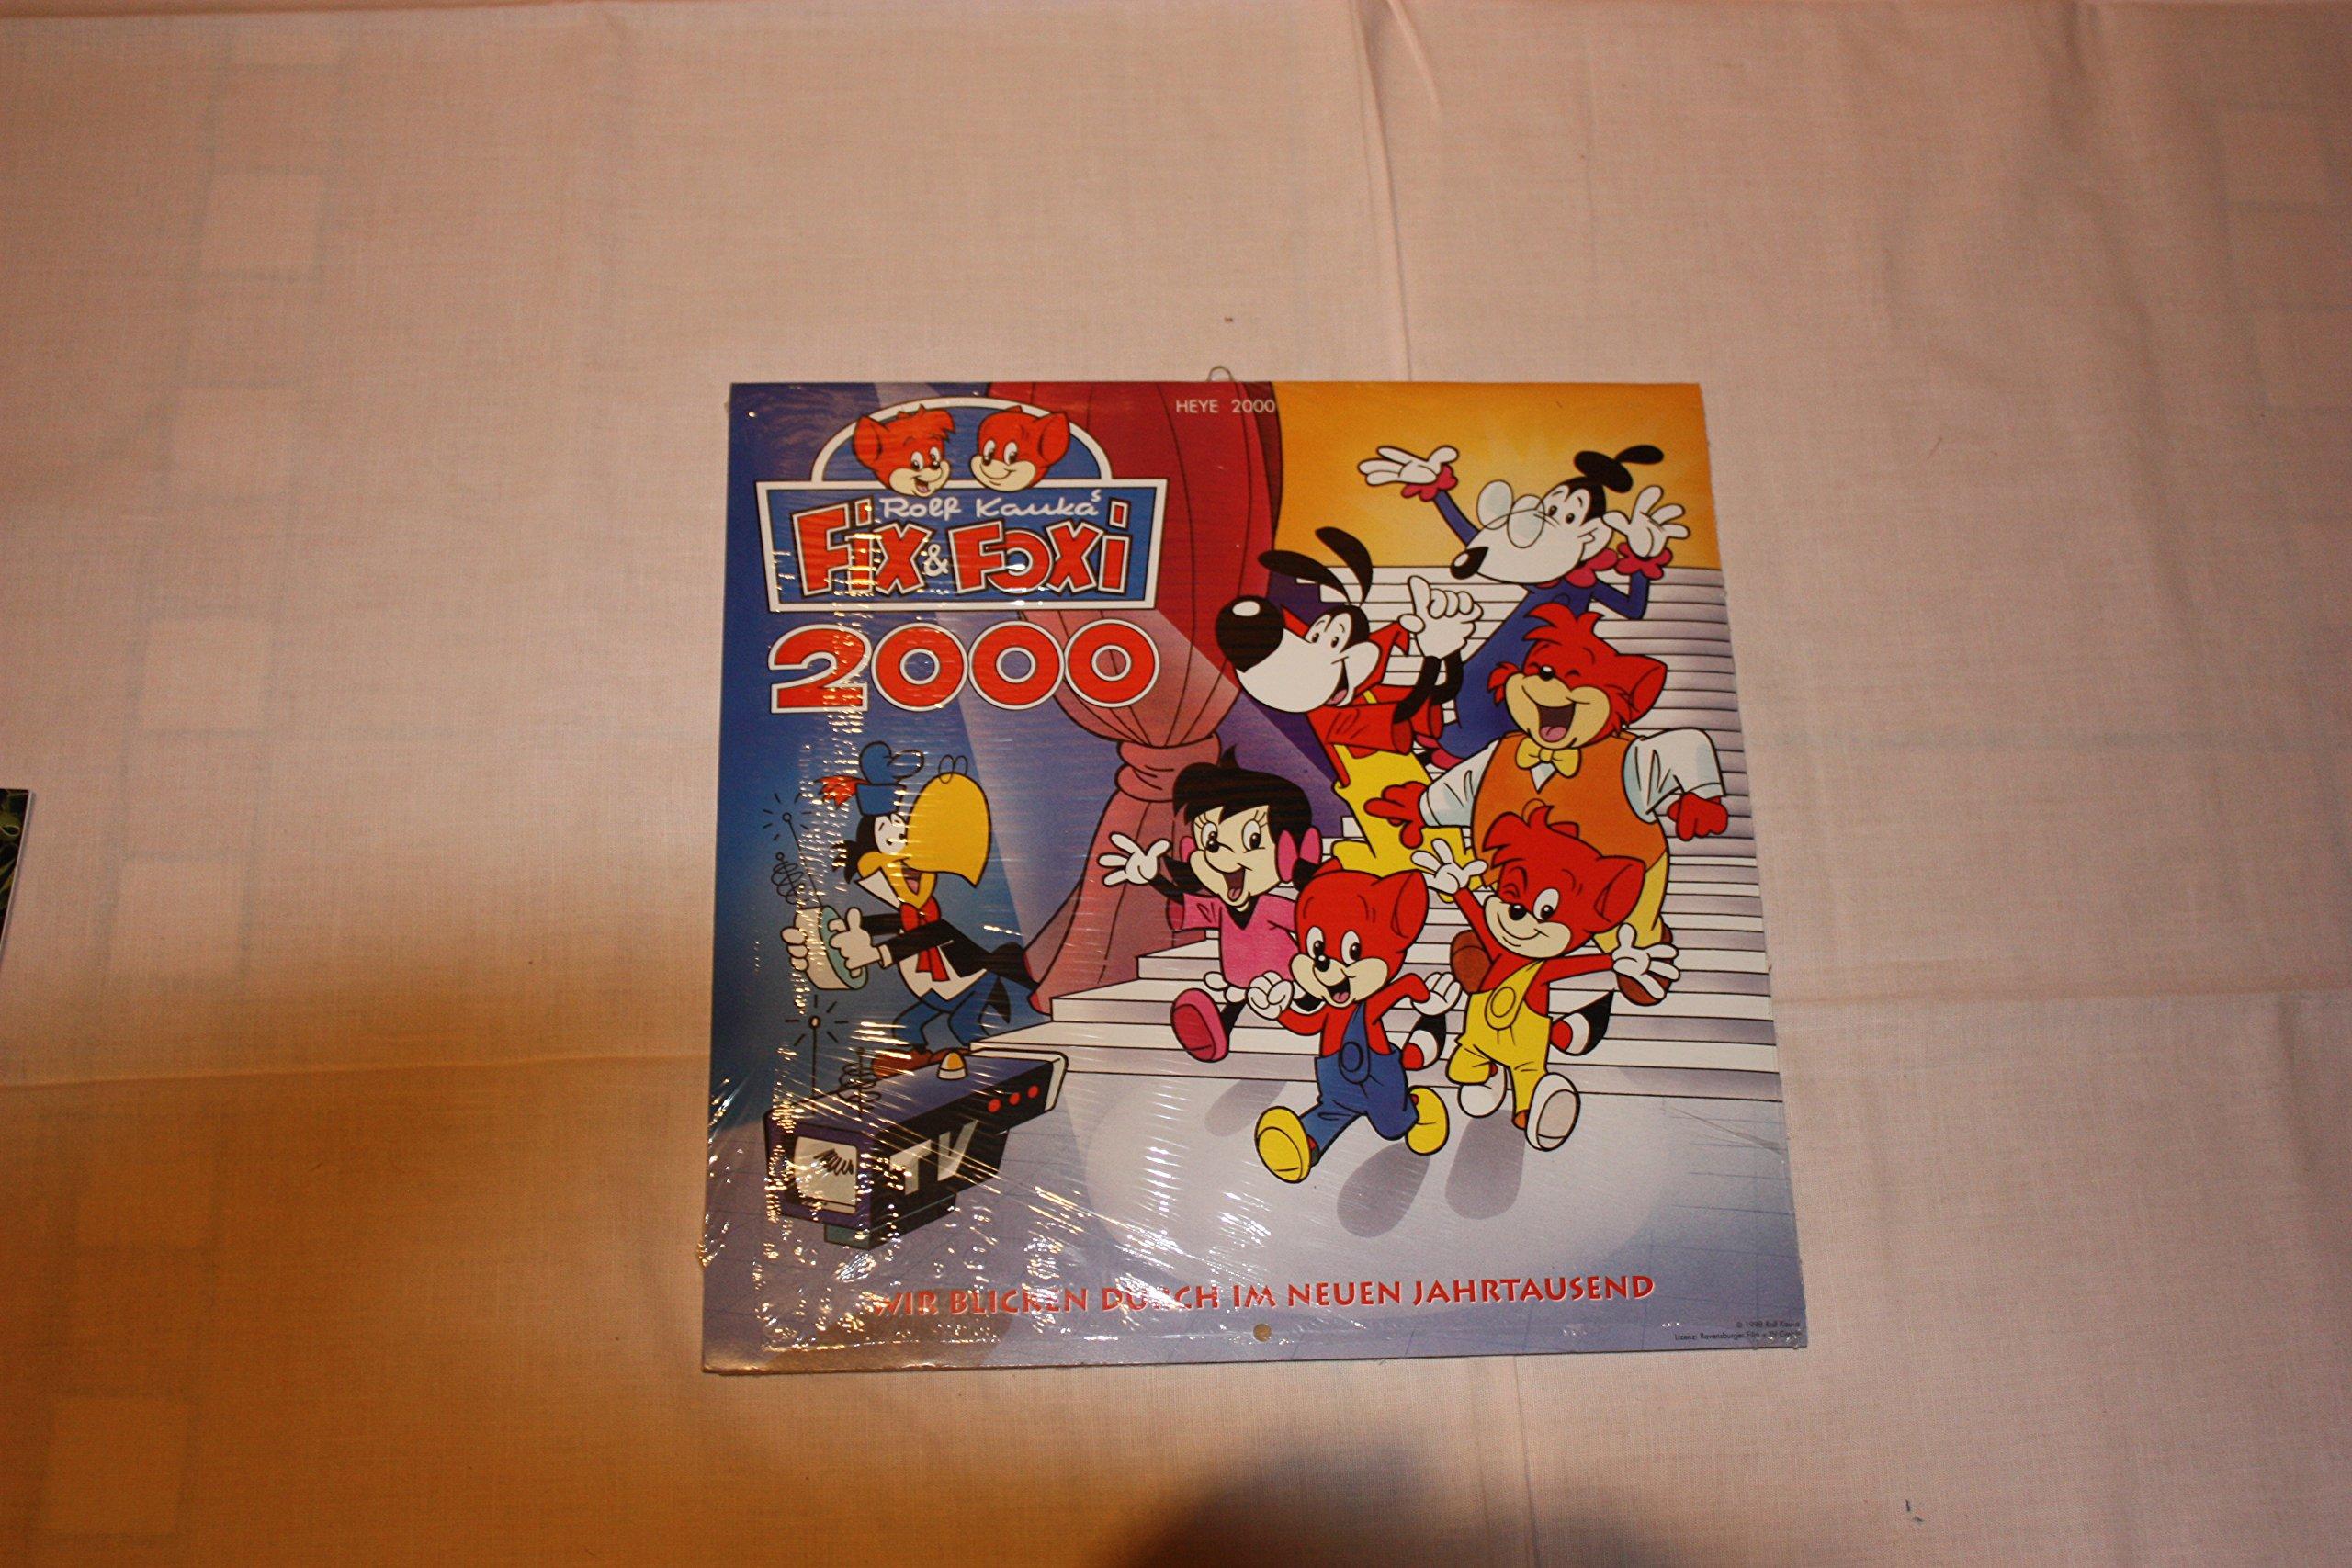 kalender-fix-foxi-maxi-date-book